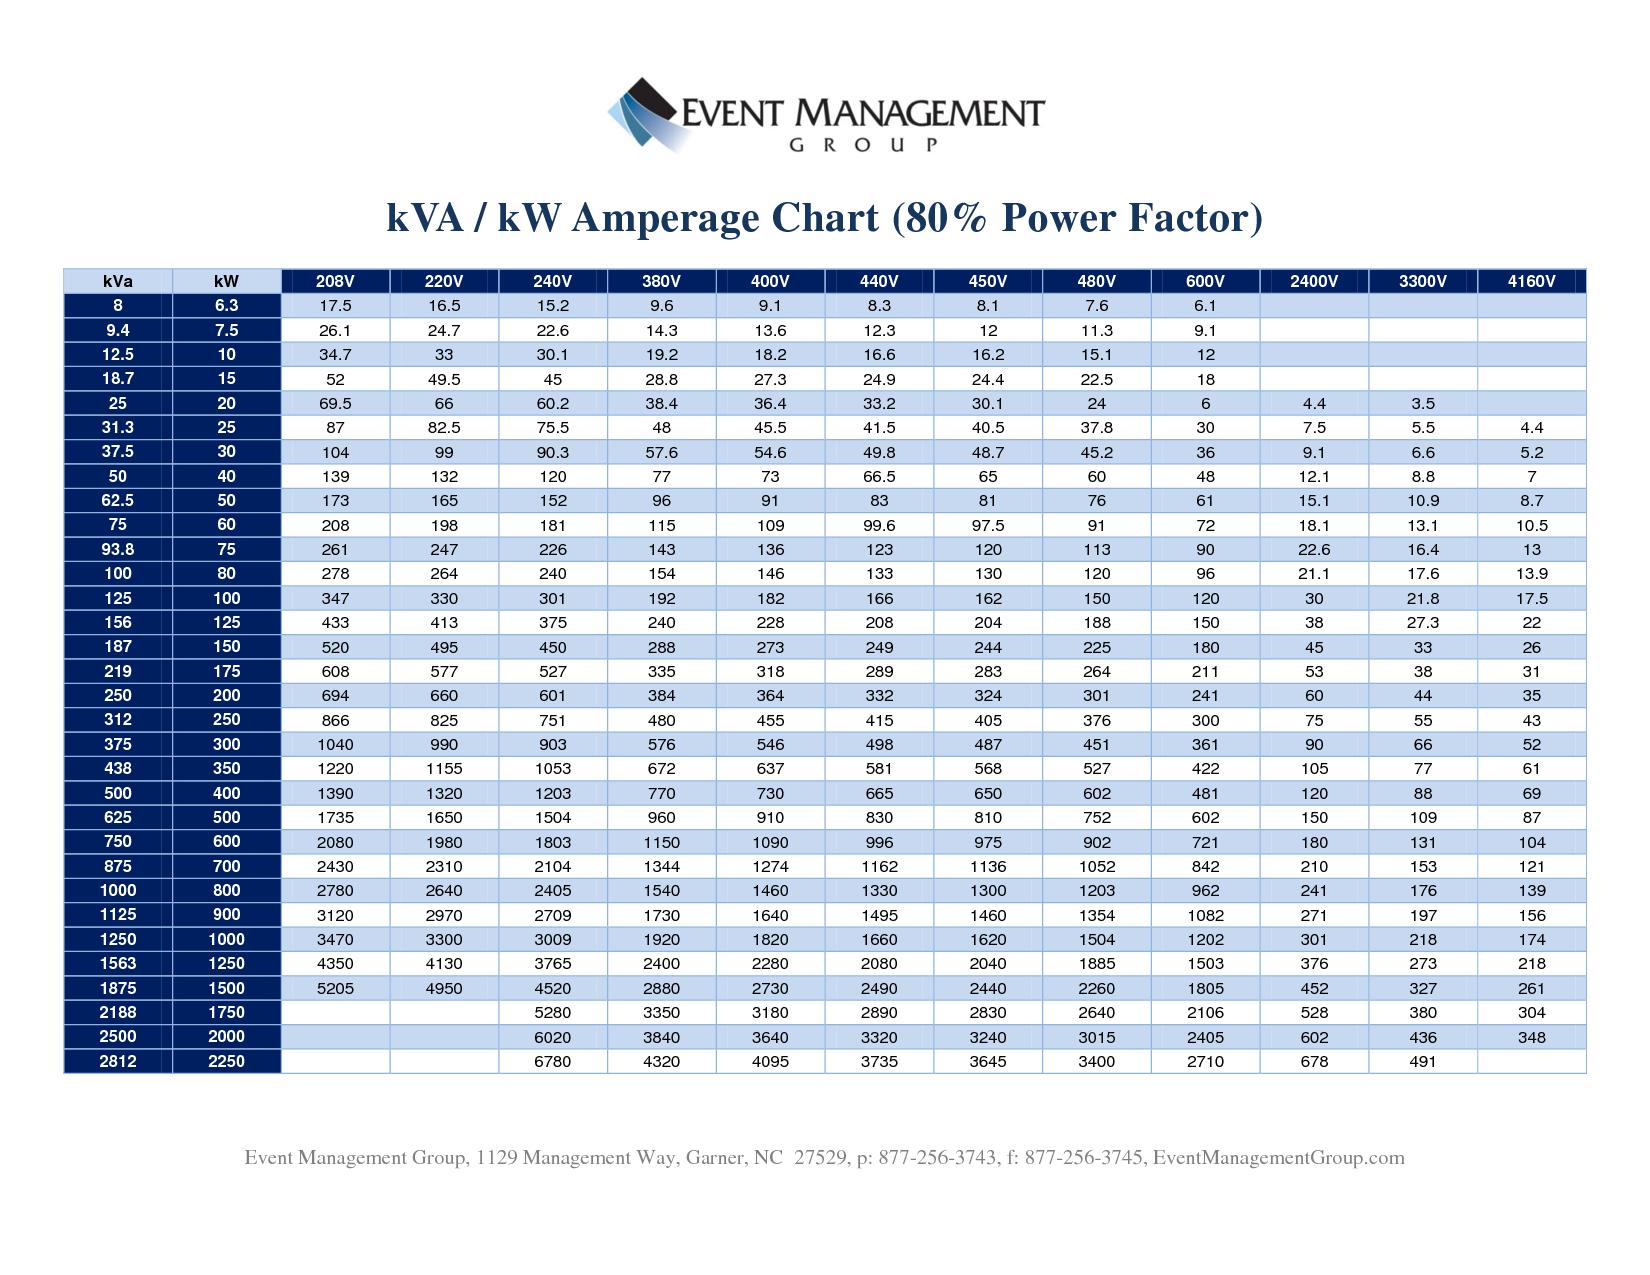 Kva to amps conversion chart energy management pinterest also kw gungoz  eye rh